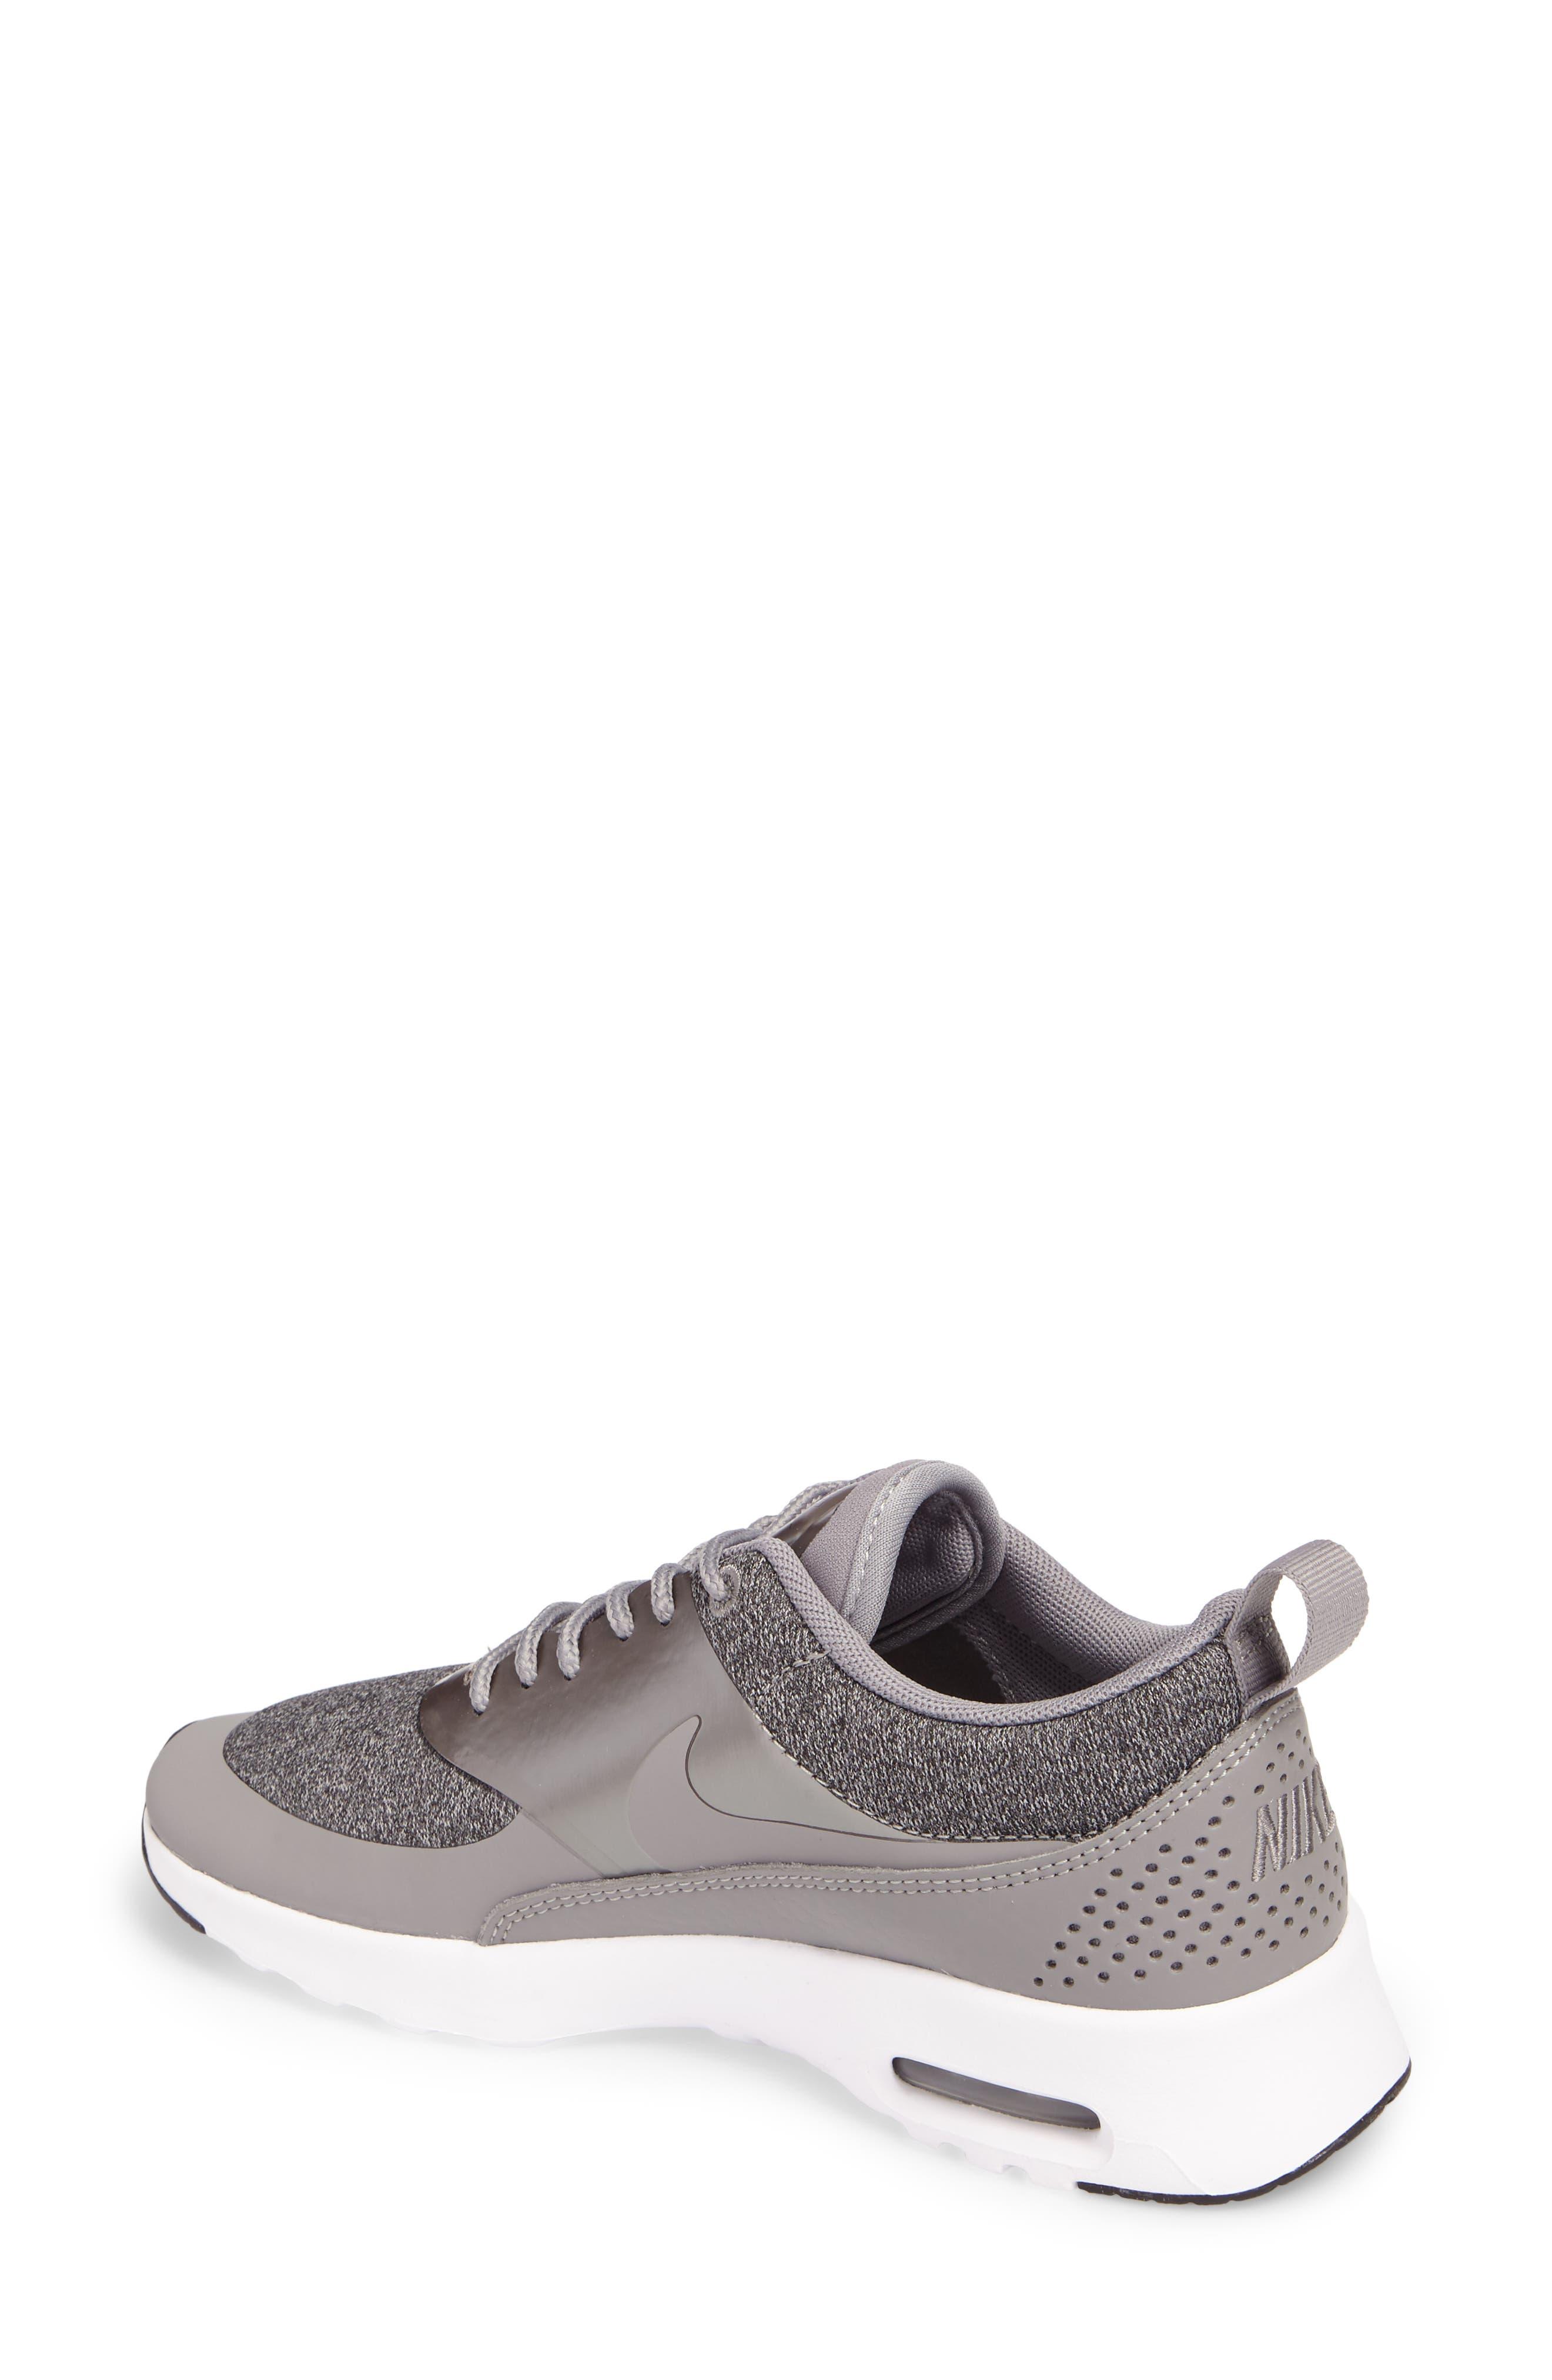 Air Max Thea Knit Sneaker,                             Alternate thumbnail 2, color,                             020